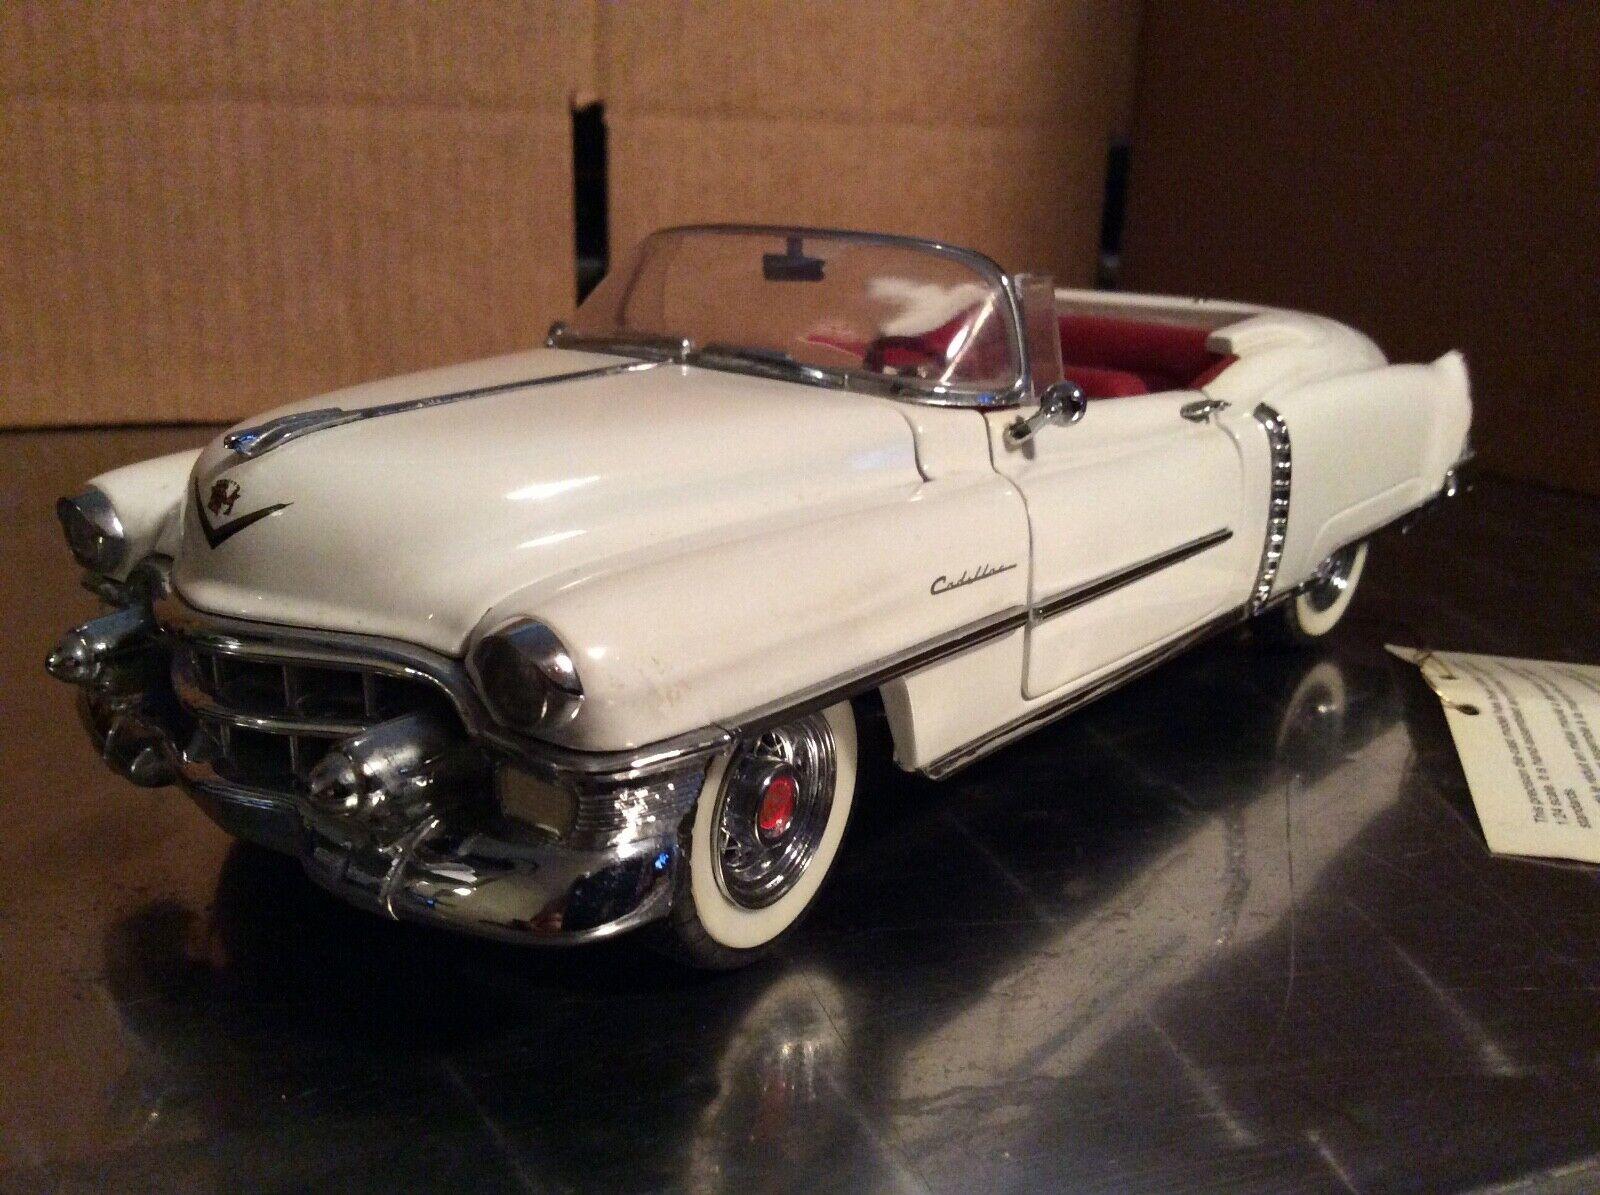 1953 Cadillac Eldorado Weiß Frankinl Mint 1 24 Lose Display Nice